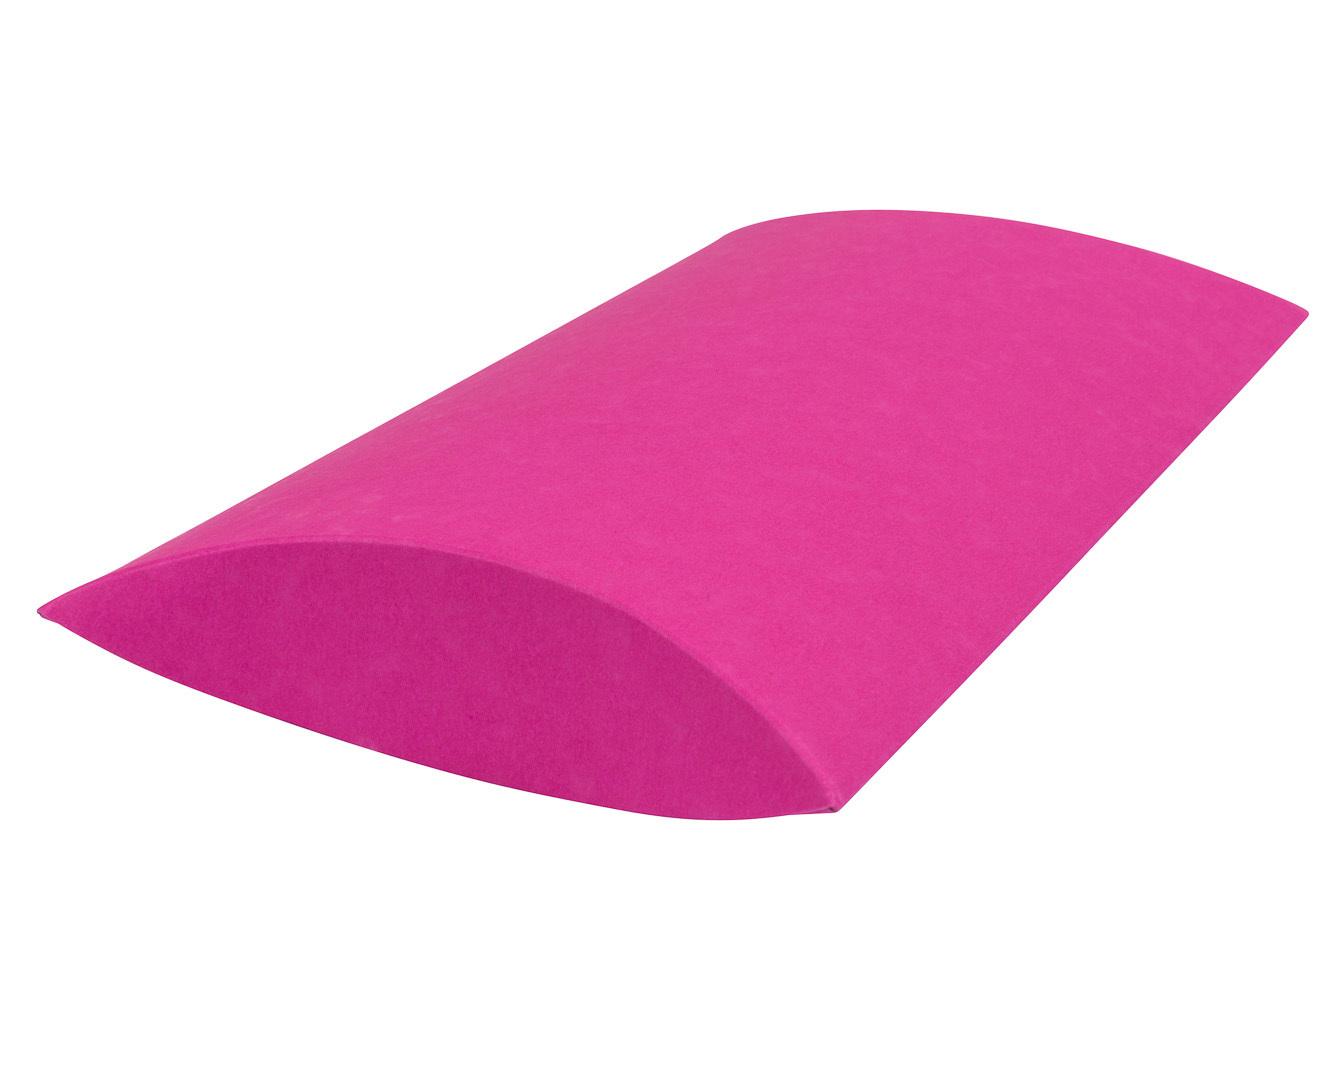 BUNTBOX Pillow Box M - Magenta